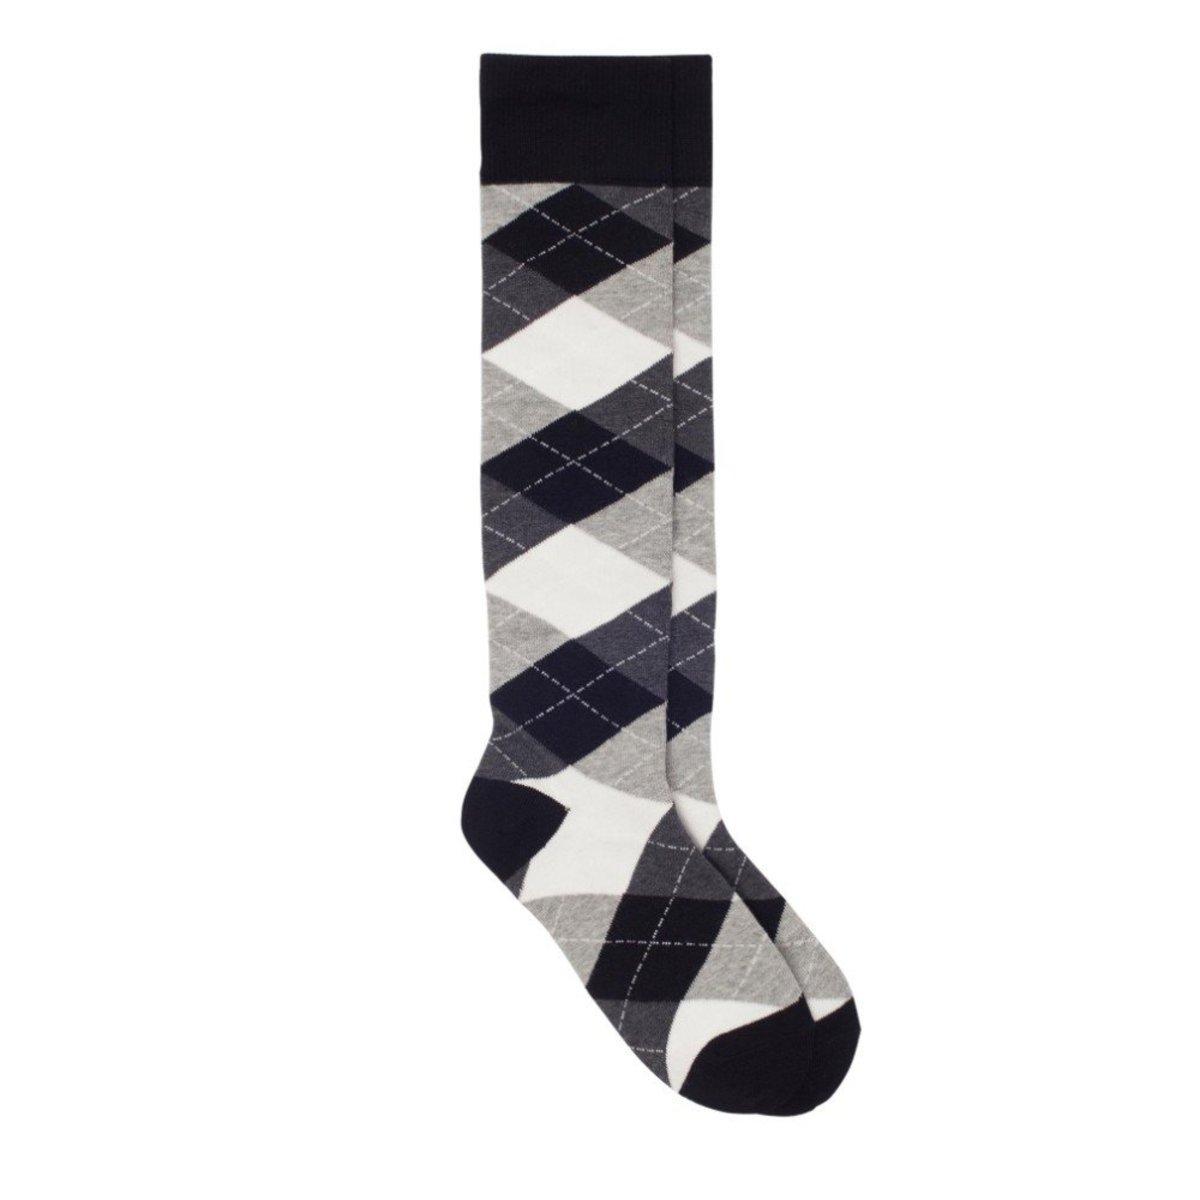 White bossini Life Mens Unisex Sport Short Socks 2 Pairs M,L